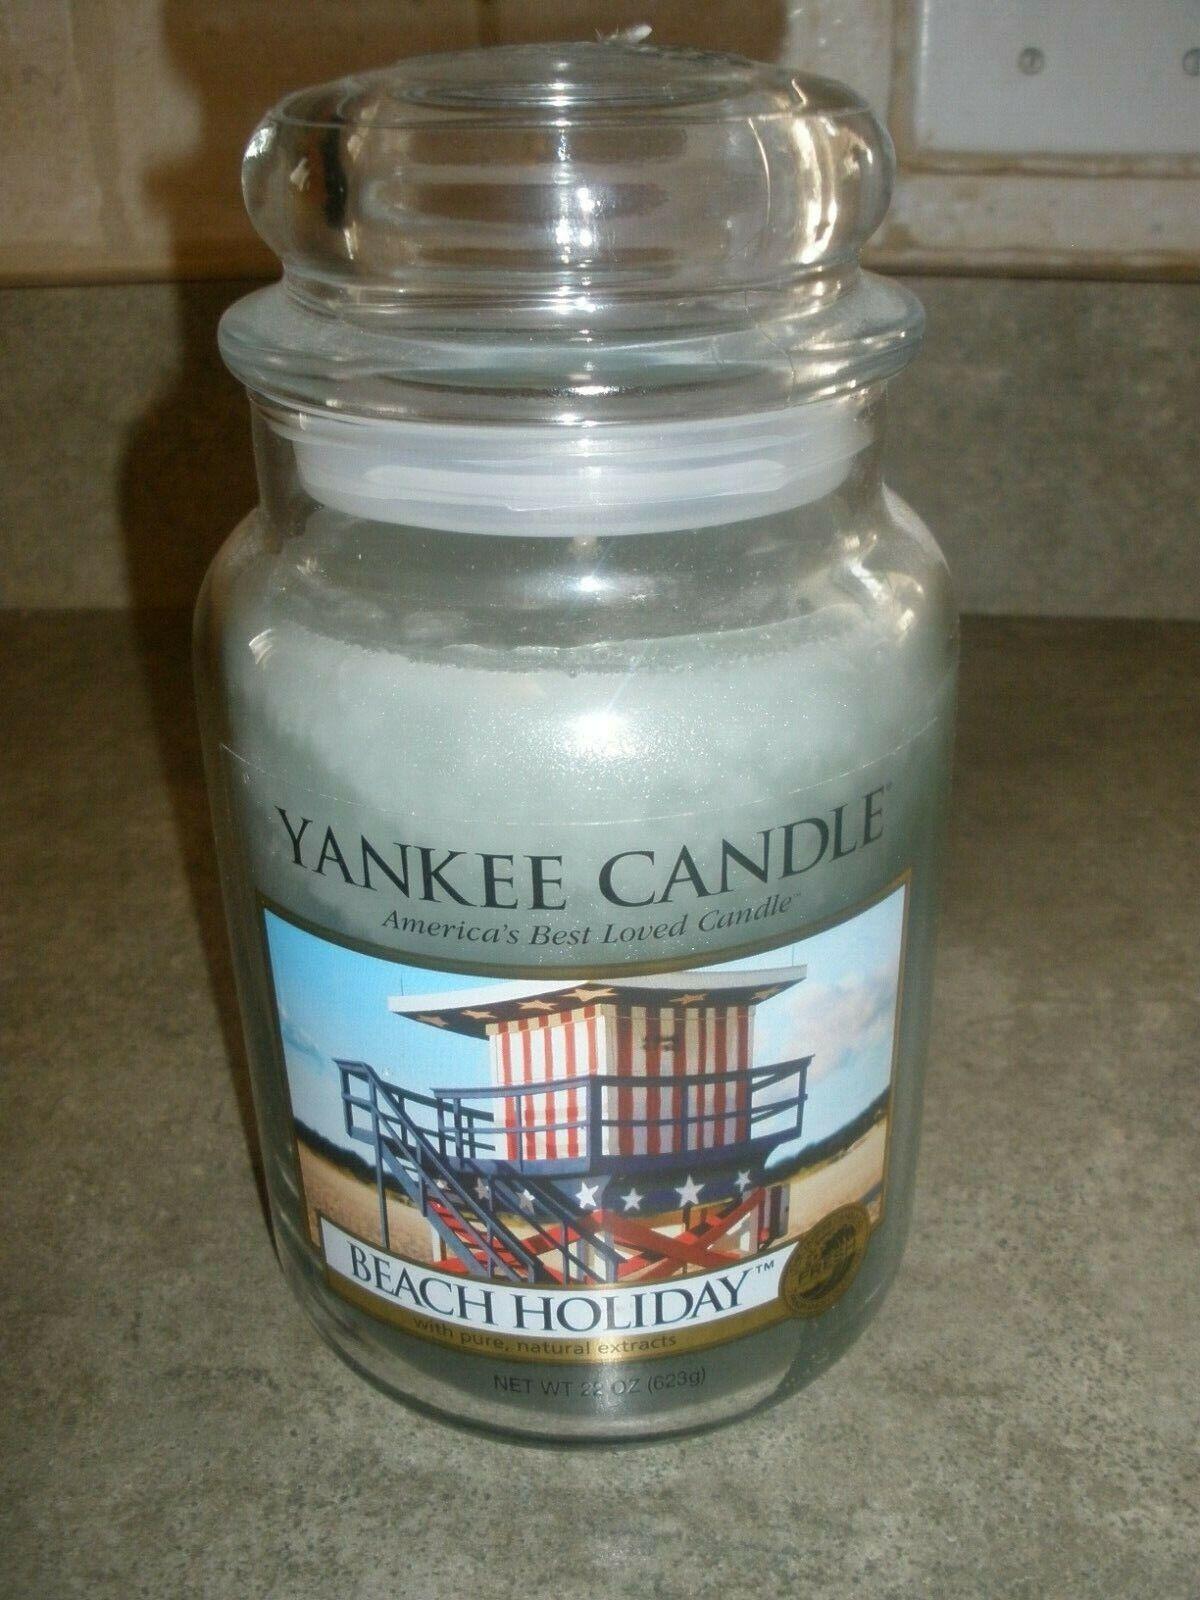 Yankee Candle Votives Rare VHTF Choice of Fragrances